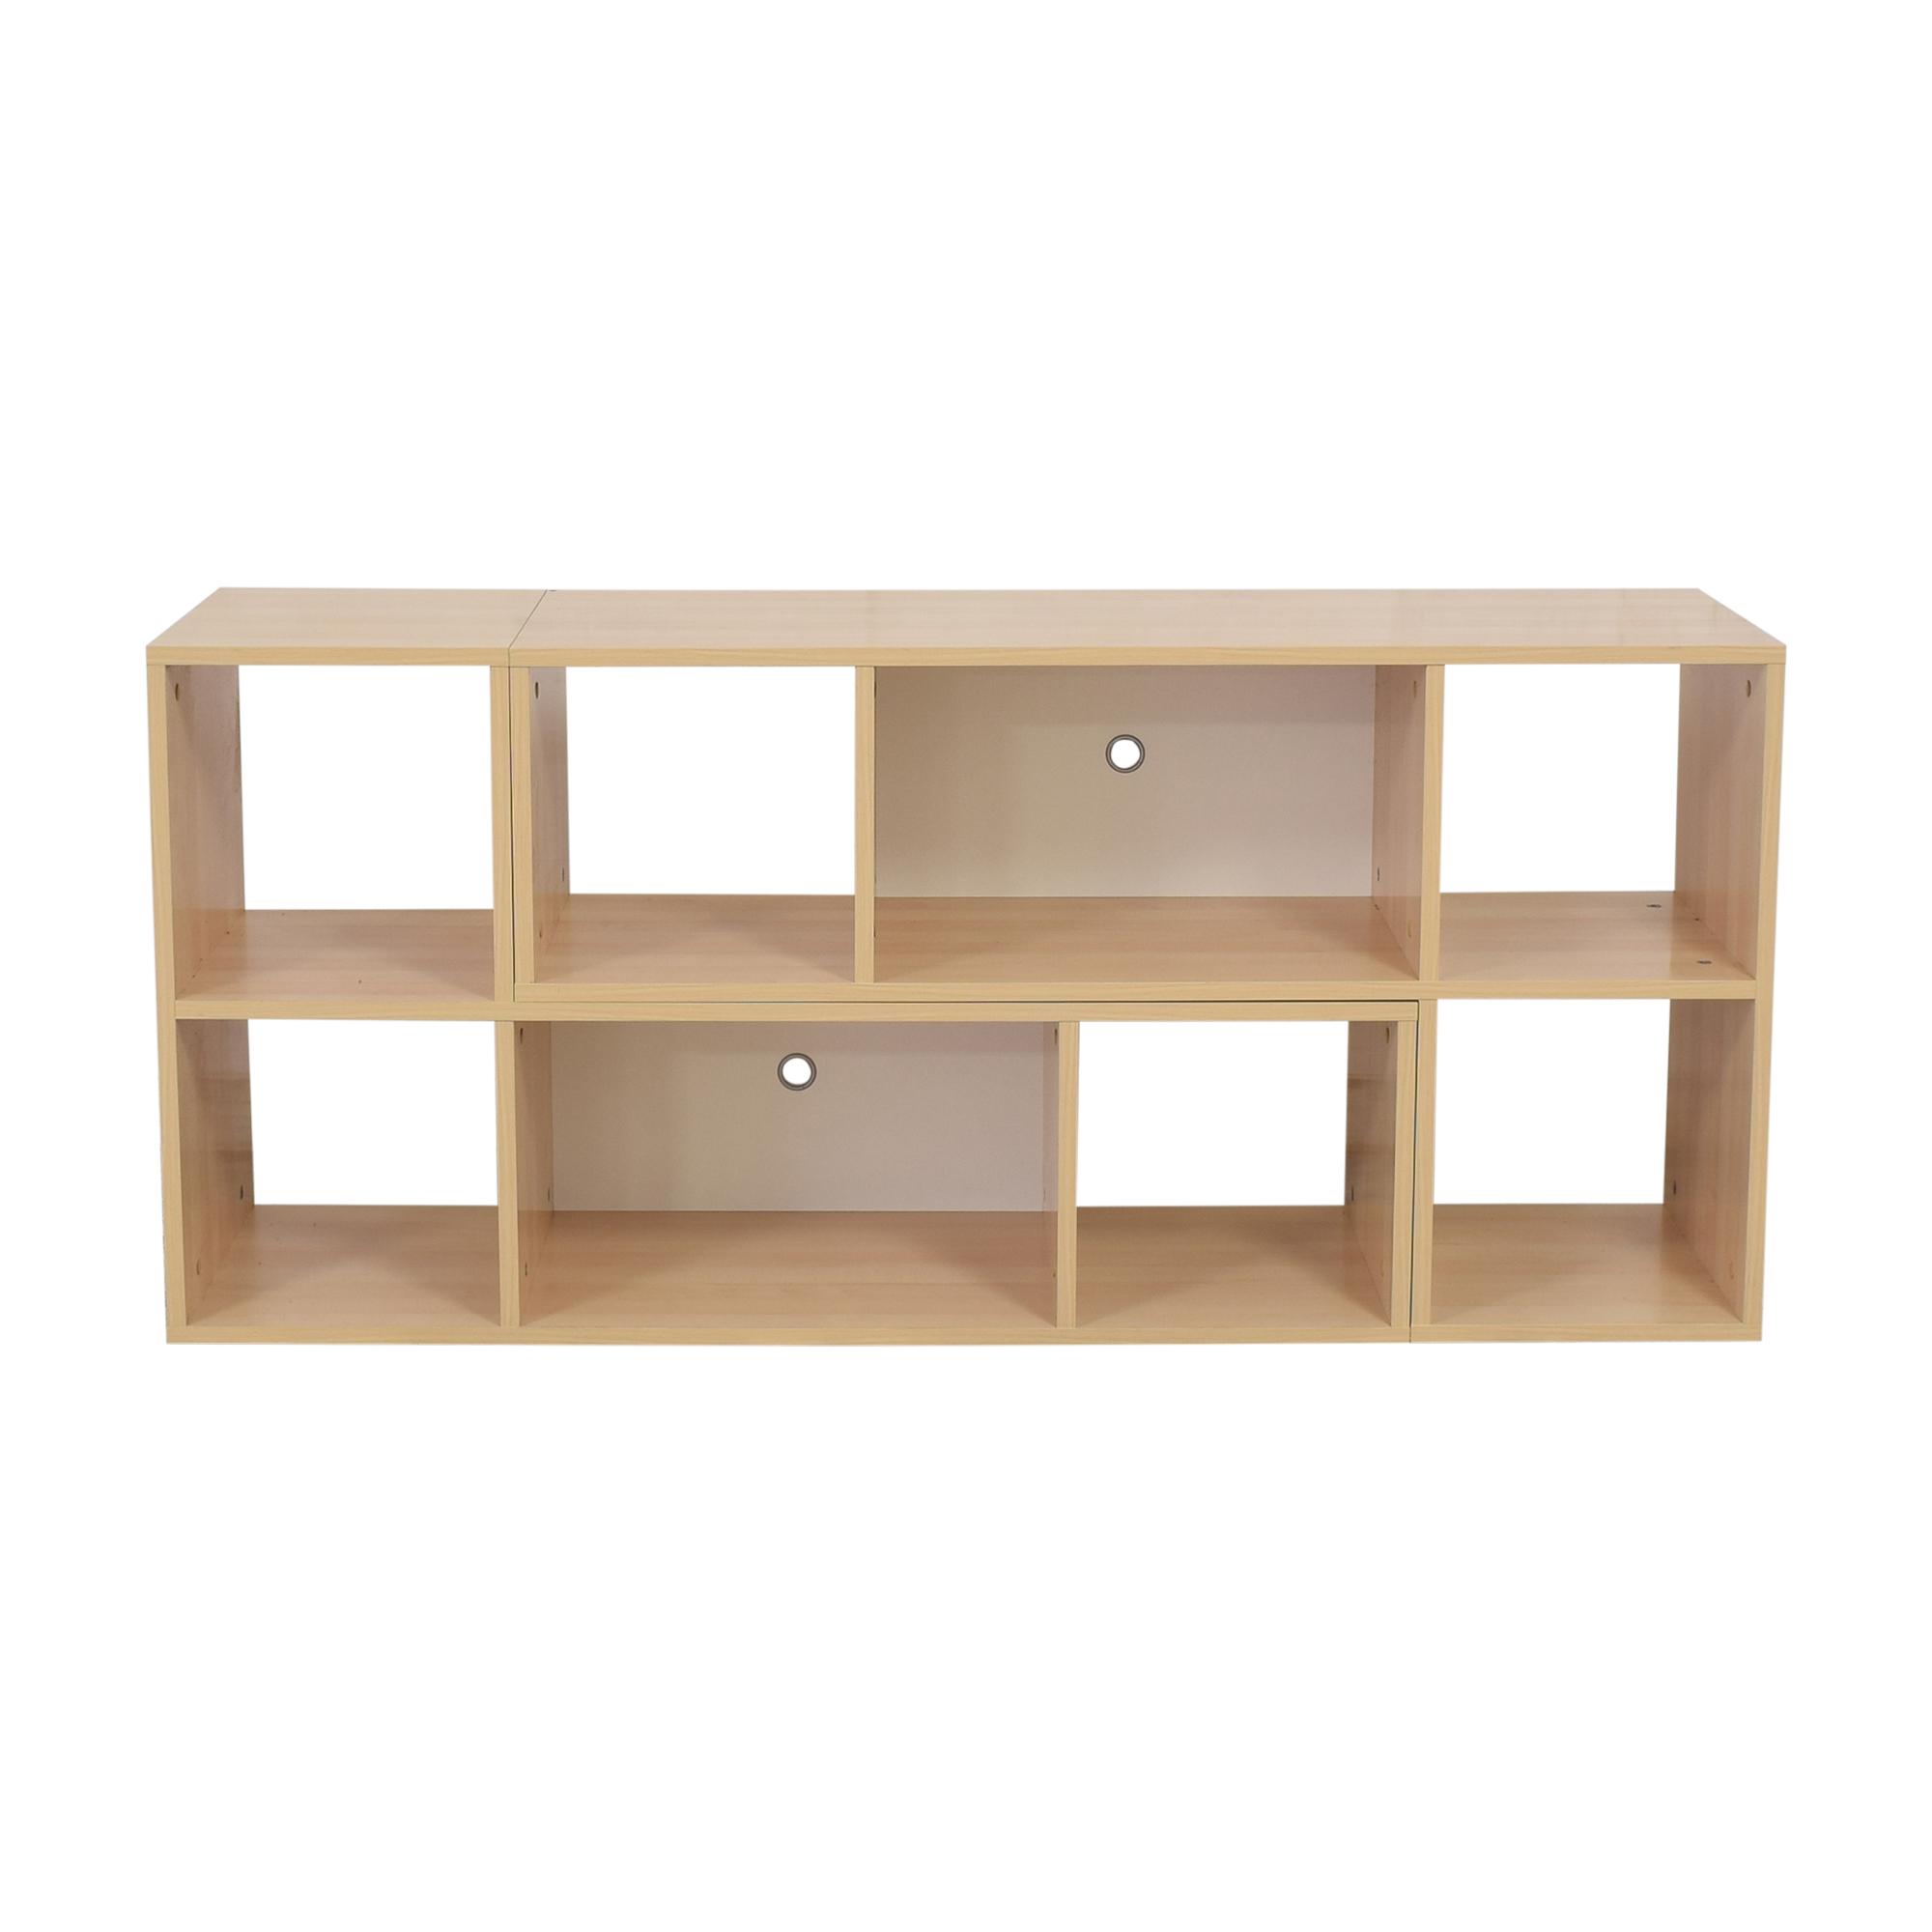 Crate & Barrel Crate & Barrel Modular Storage Shelves on sale